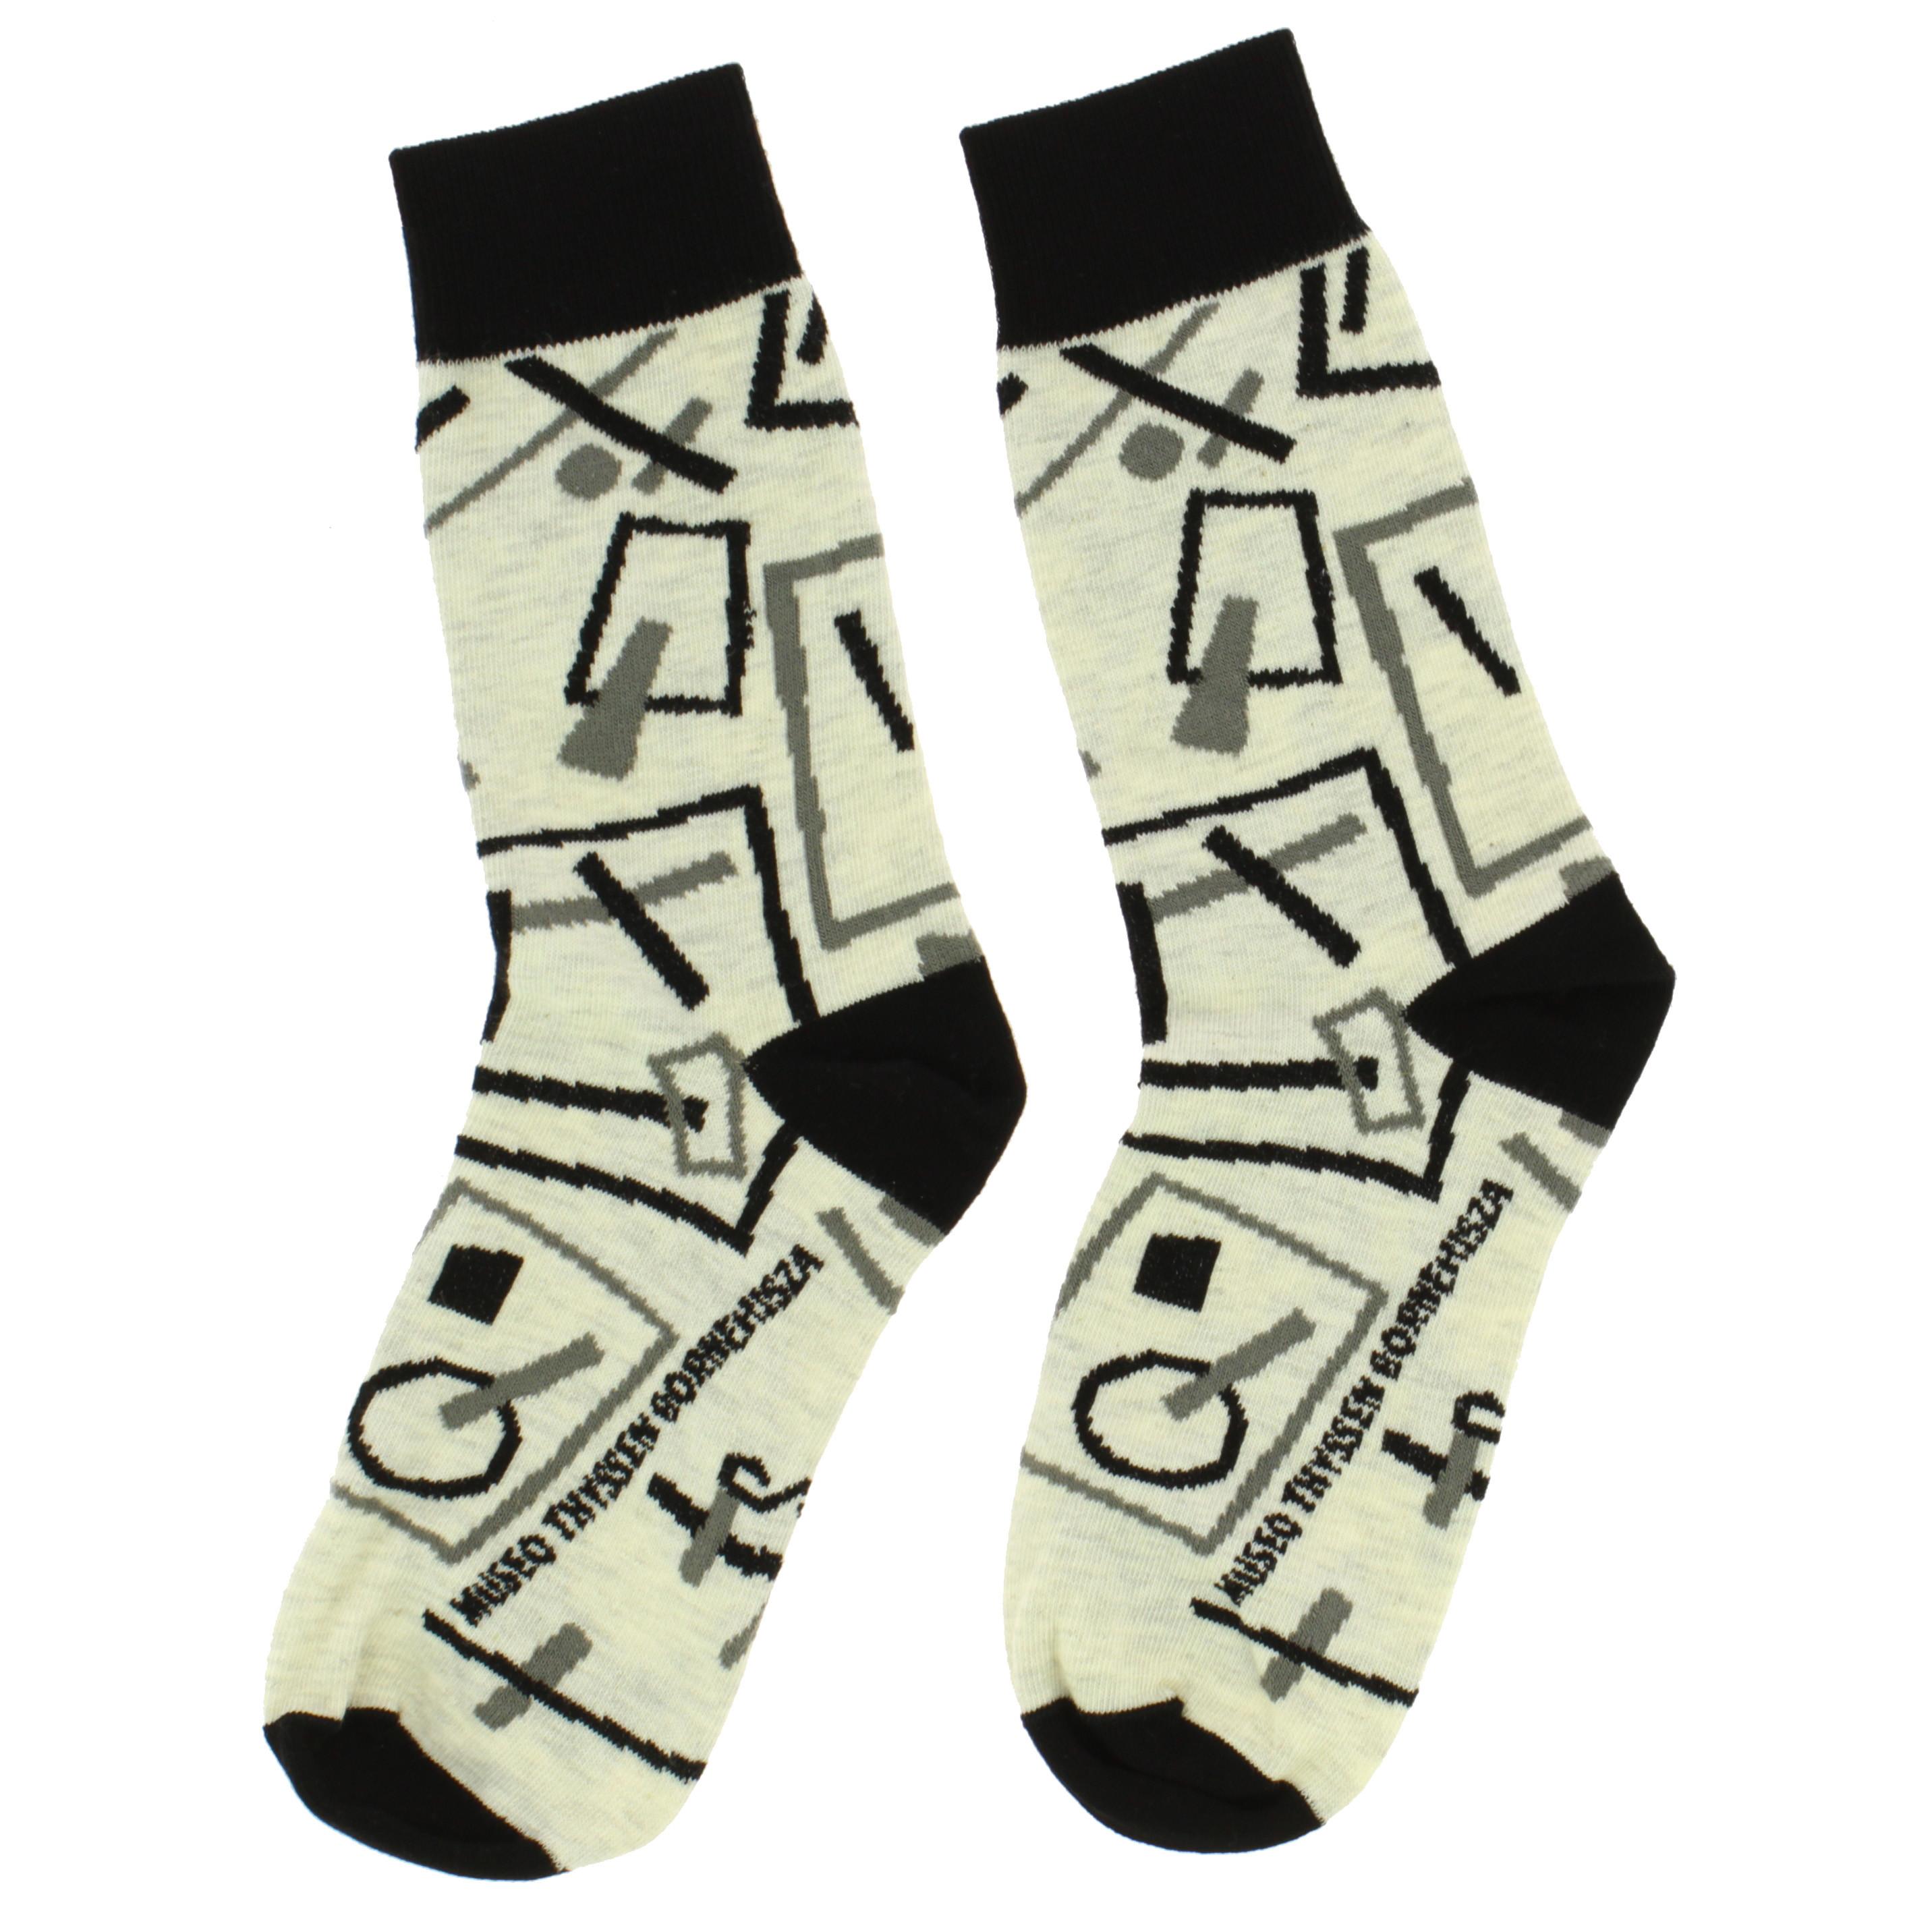 Socks Malévich Suprematist Drawings